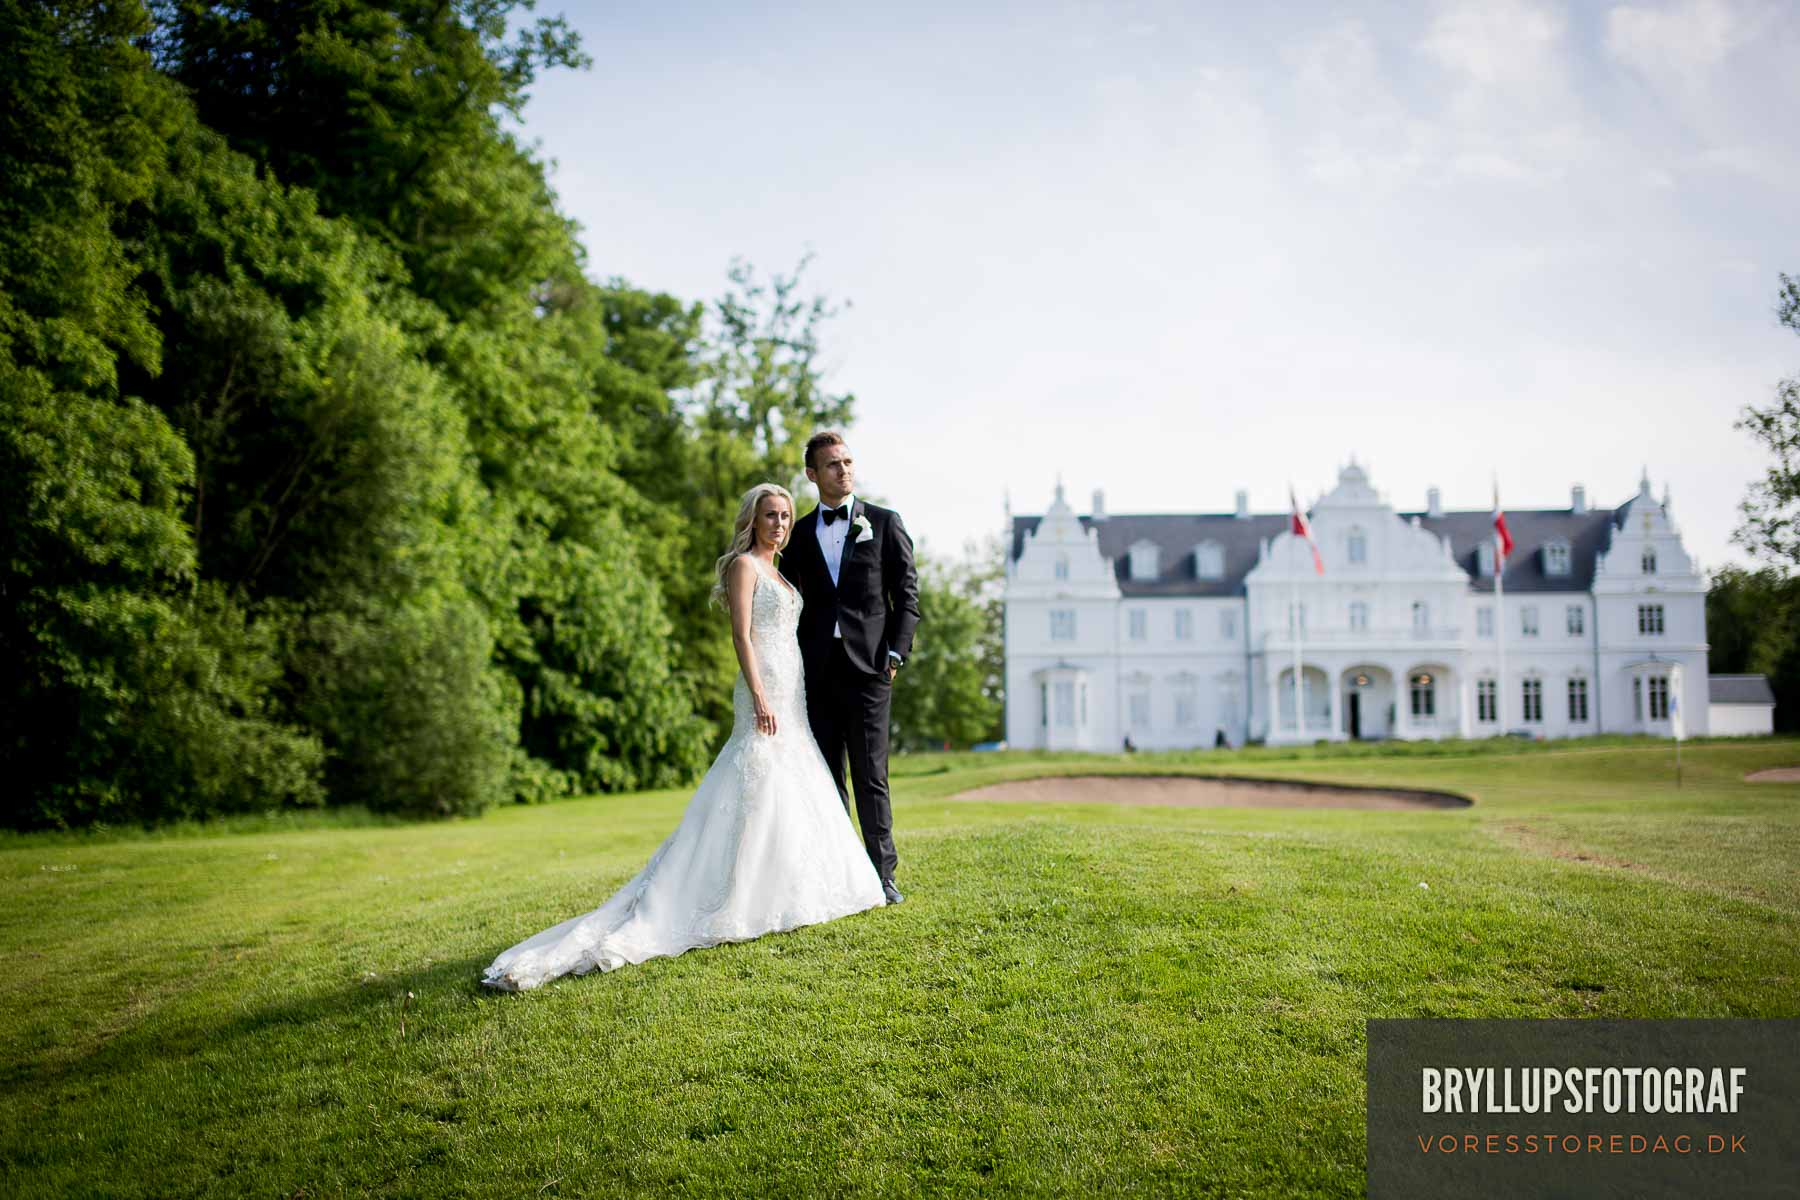 Romantiske & naturlige bryllupsbilleder